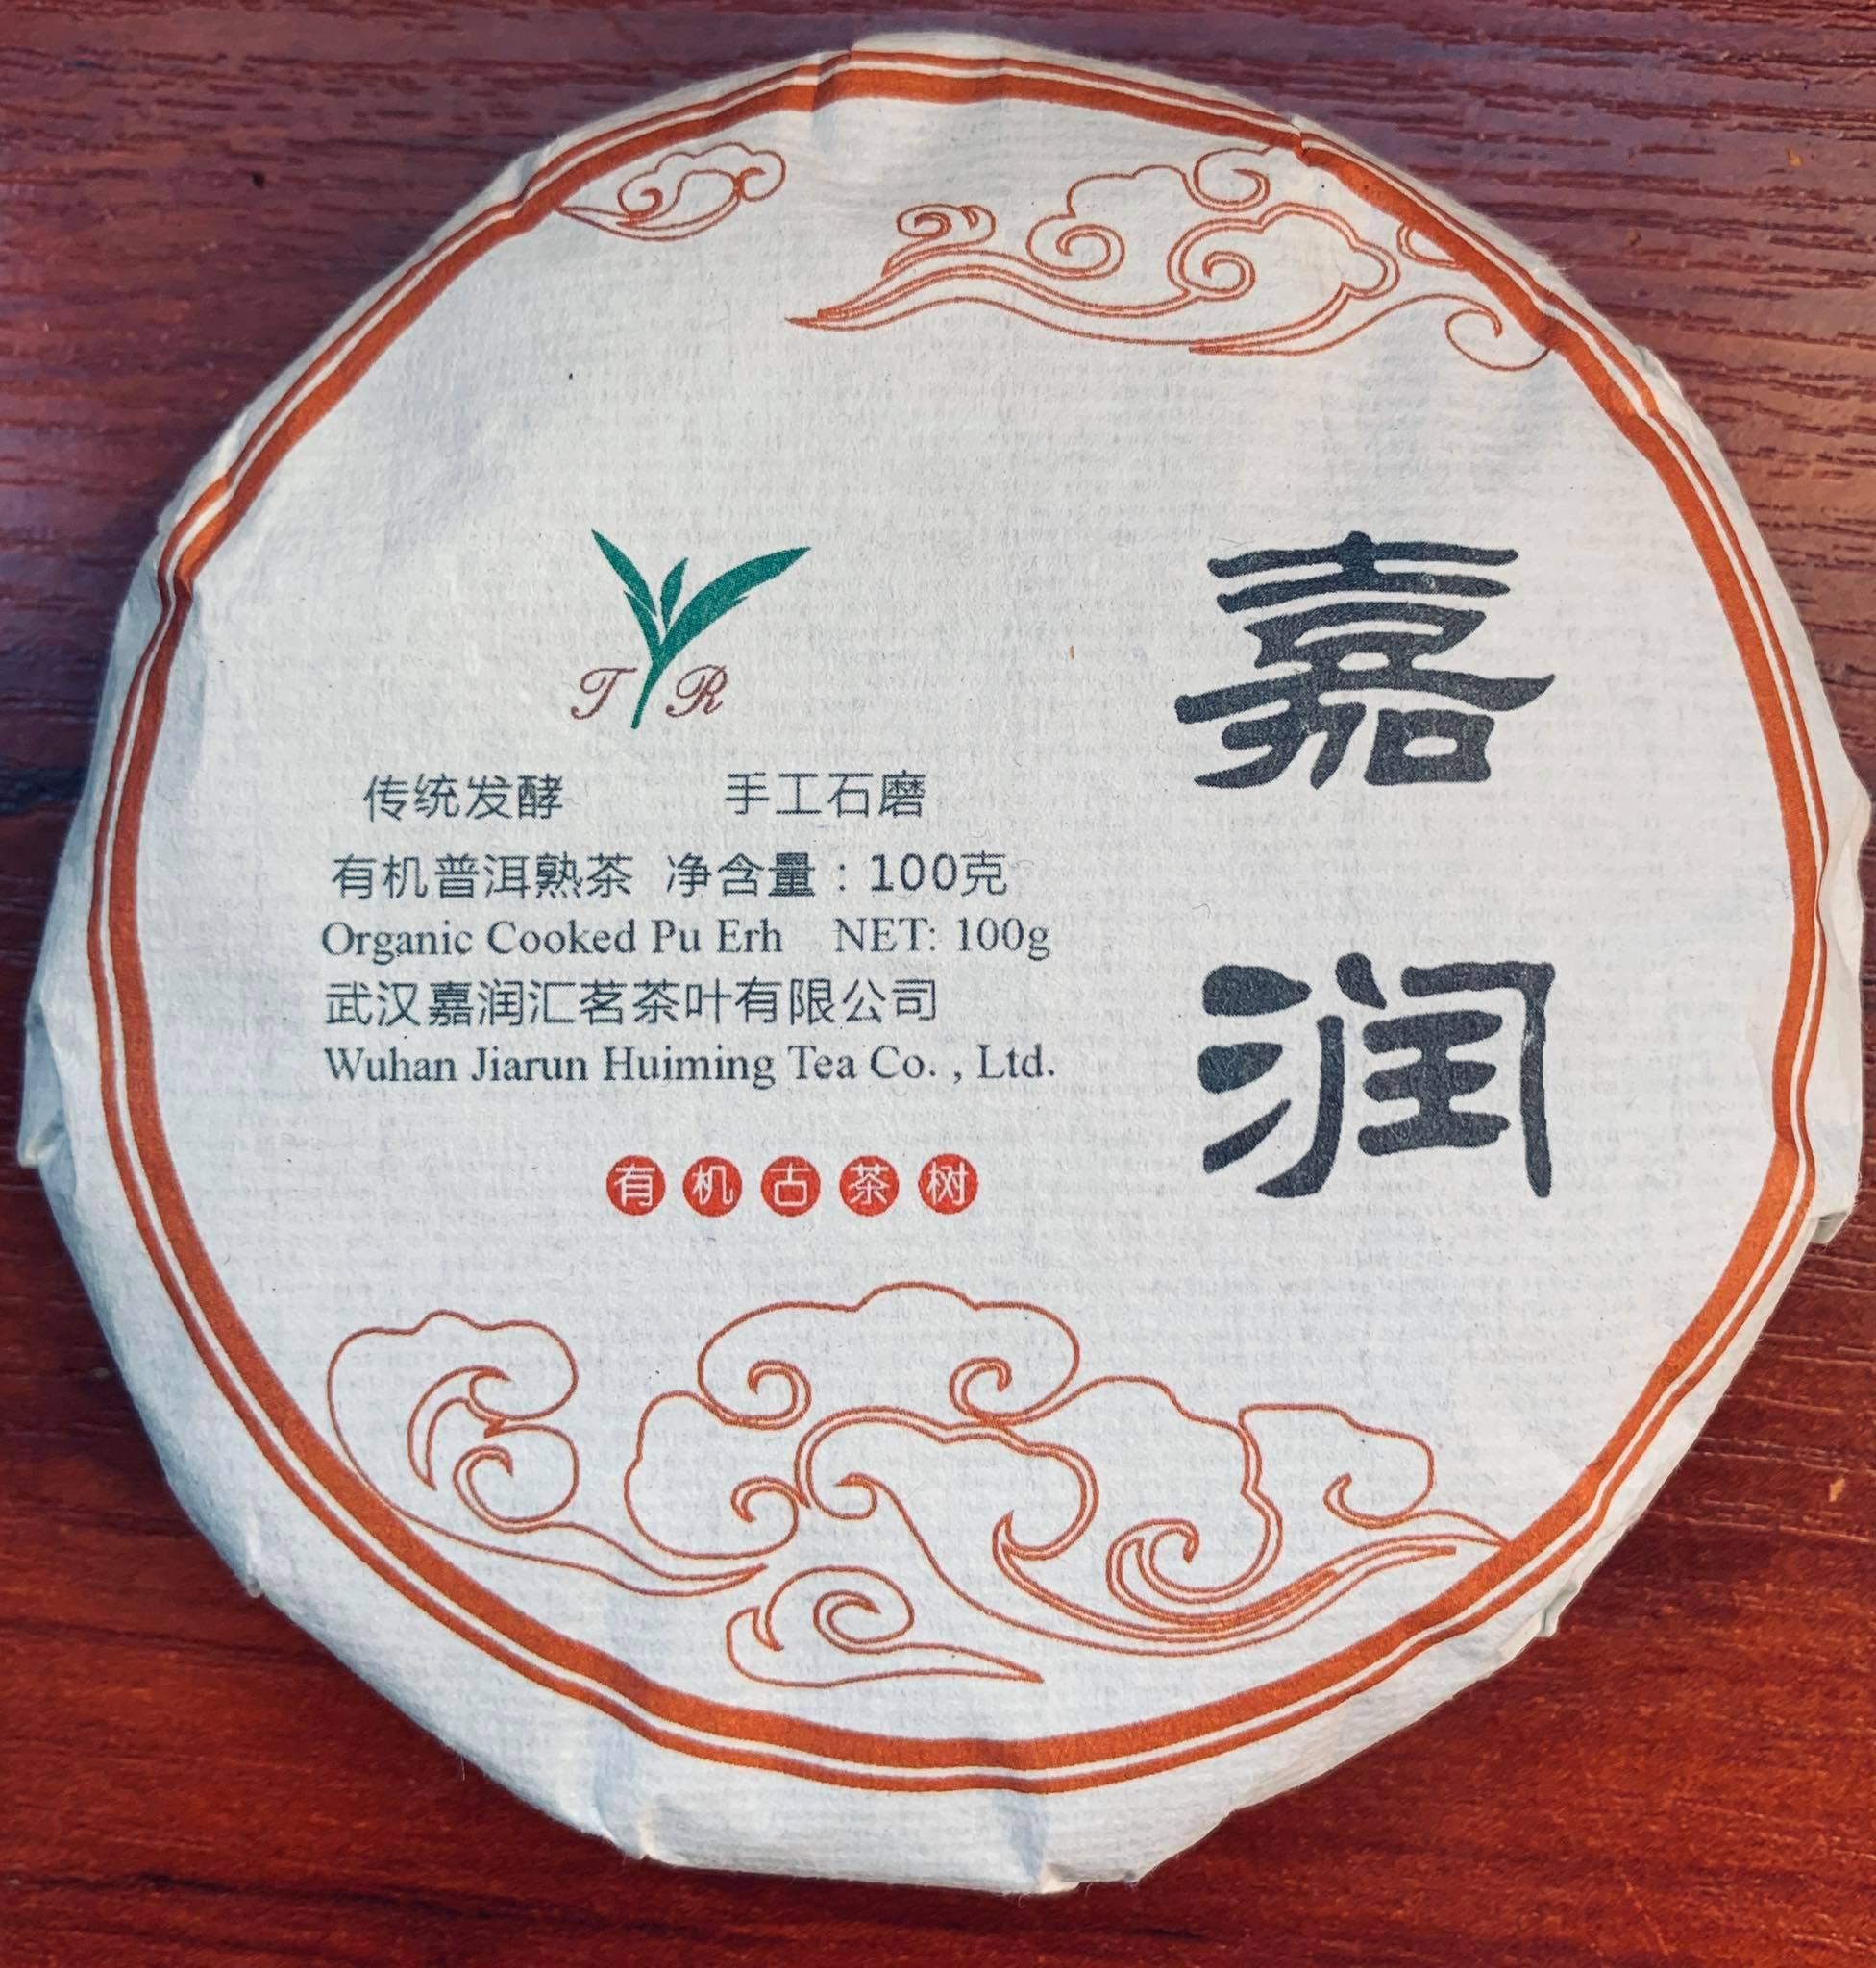 Organic Cooked Pu Erh Cake 100 g